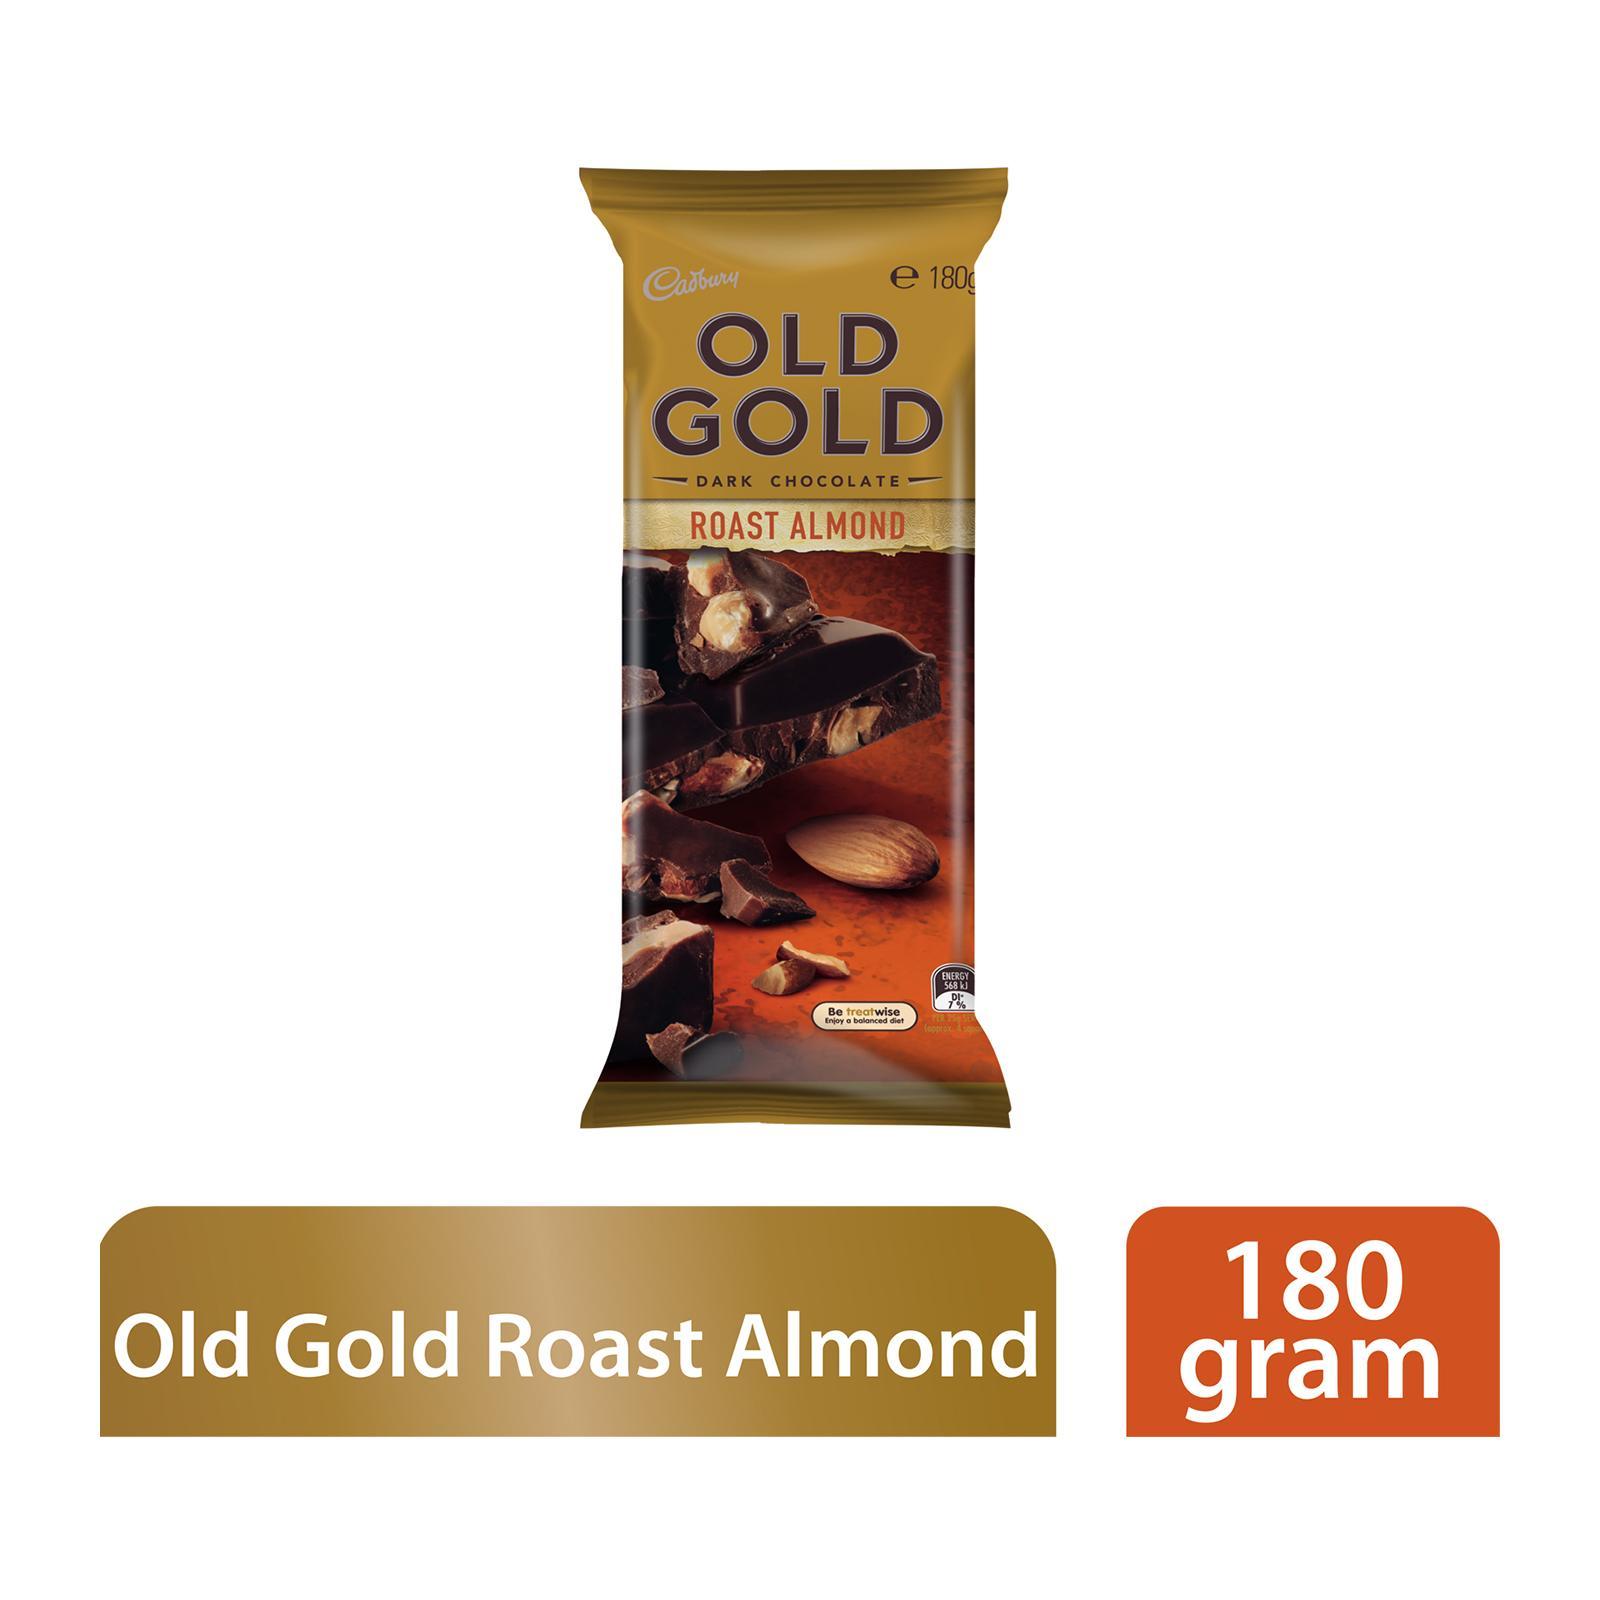 Cadbury Old Gold Roast Almond Dark Chocolate Block